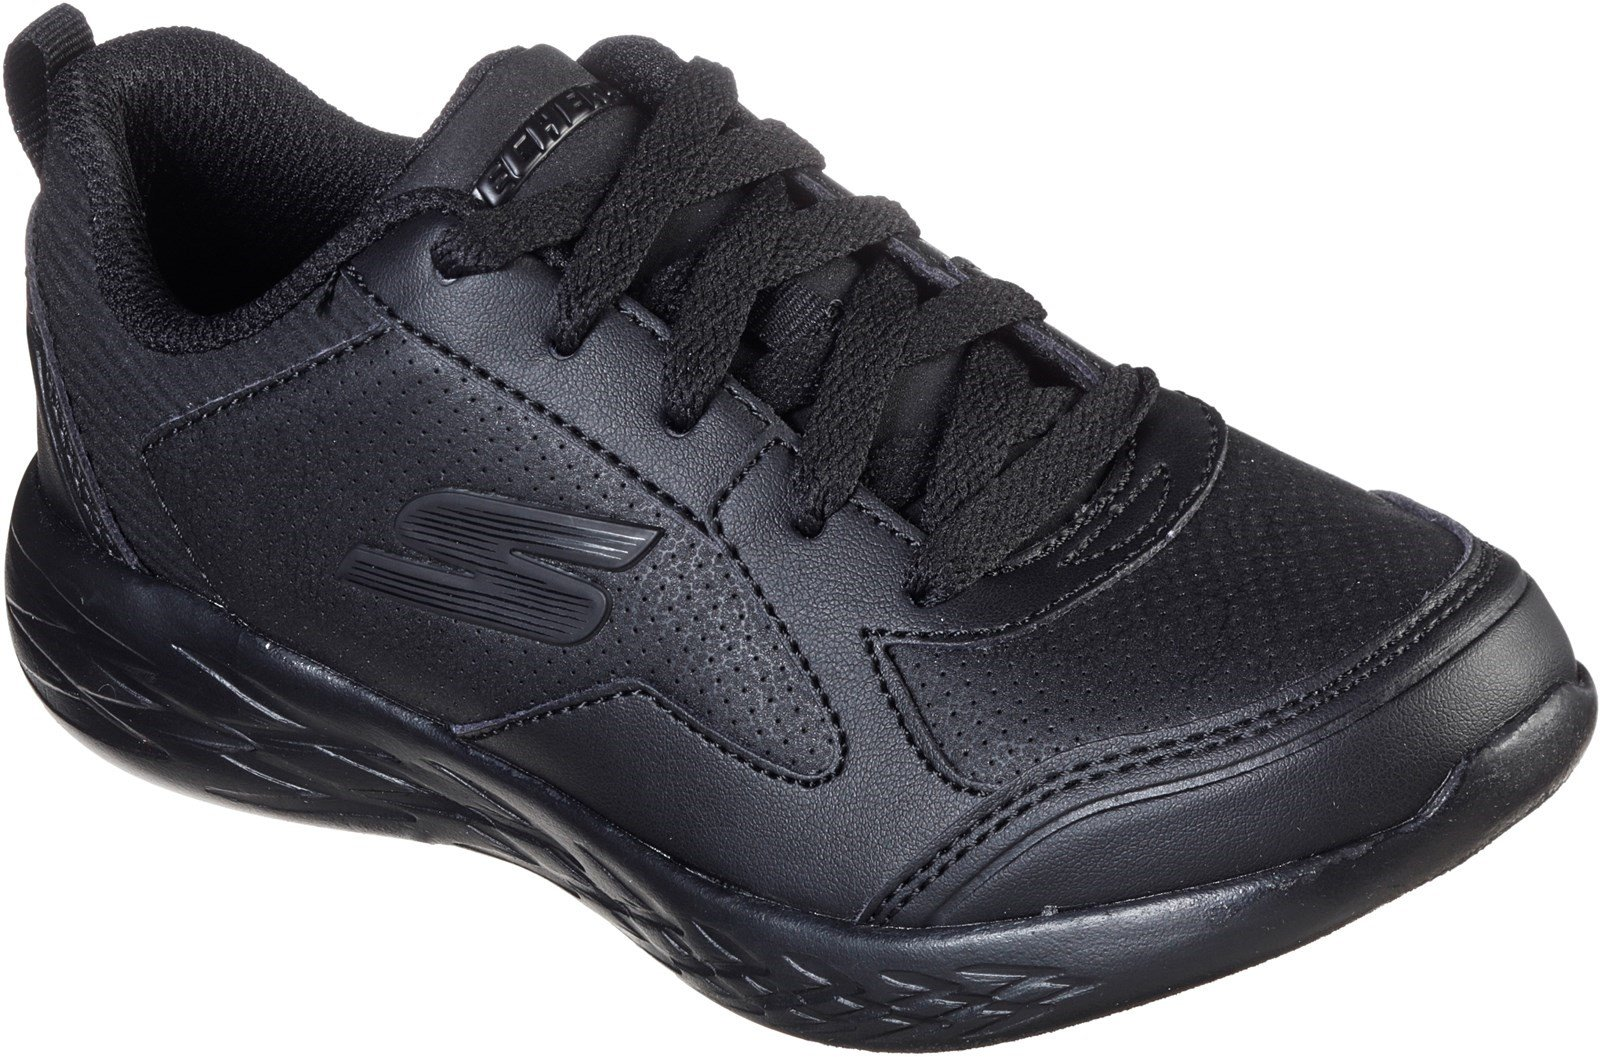 Skechers Kid's Go Run 600 Bexor School Trainer Black 32517 - Black/Black 12